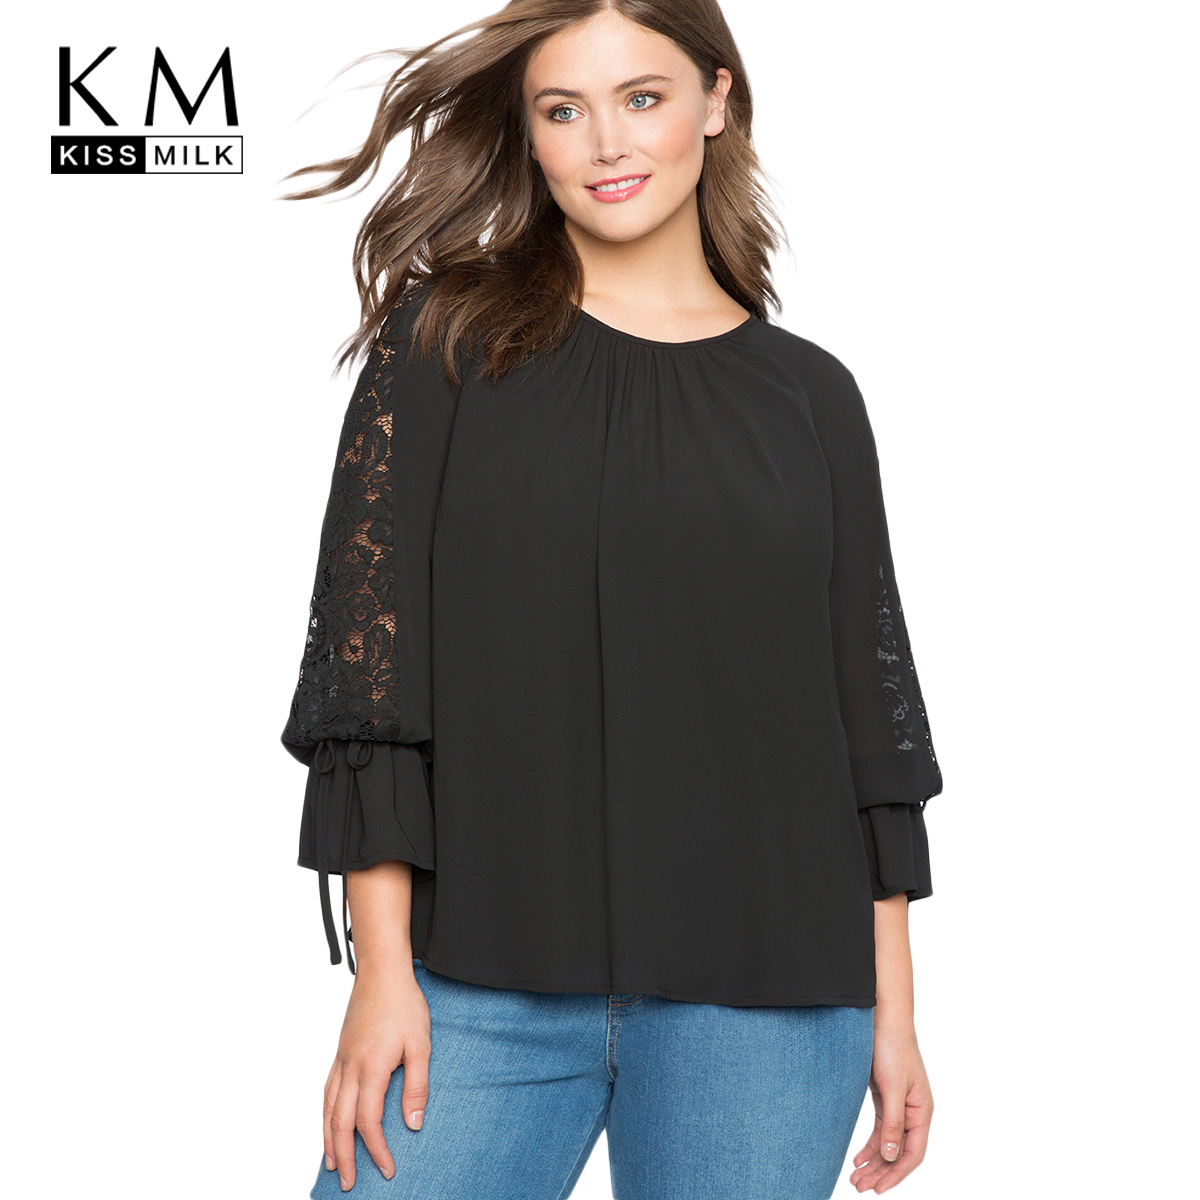 bf994fd5ae052a Kissmilk 2018 Plus Size Patchwork Women Blouses Big Size Floral Lace O-neck  Pleated Female. US $21.82. (28). 29 orders. Fashion Lace Vintage Women's  Autumn ...